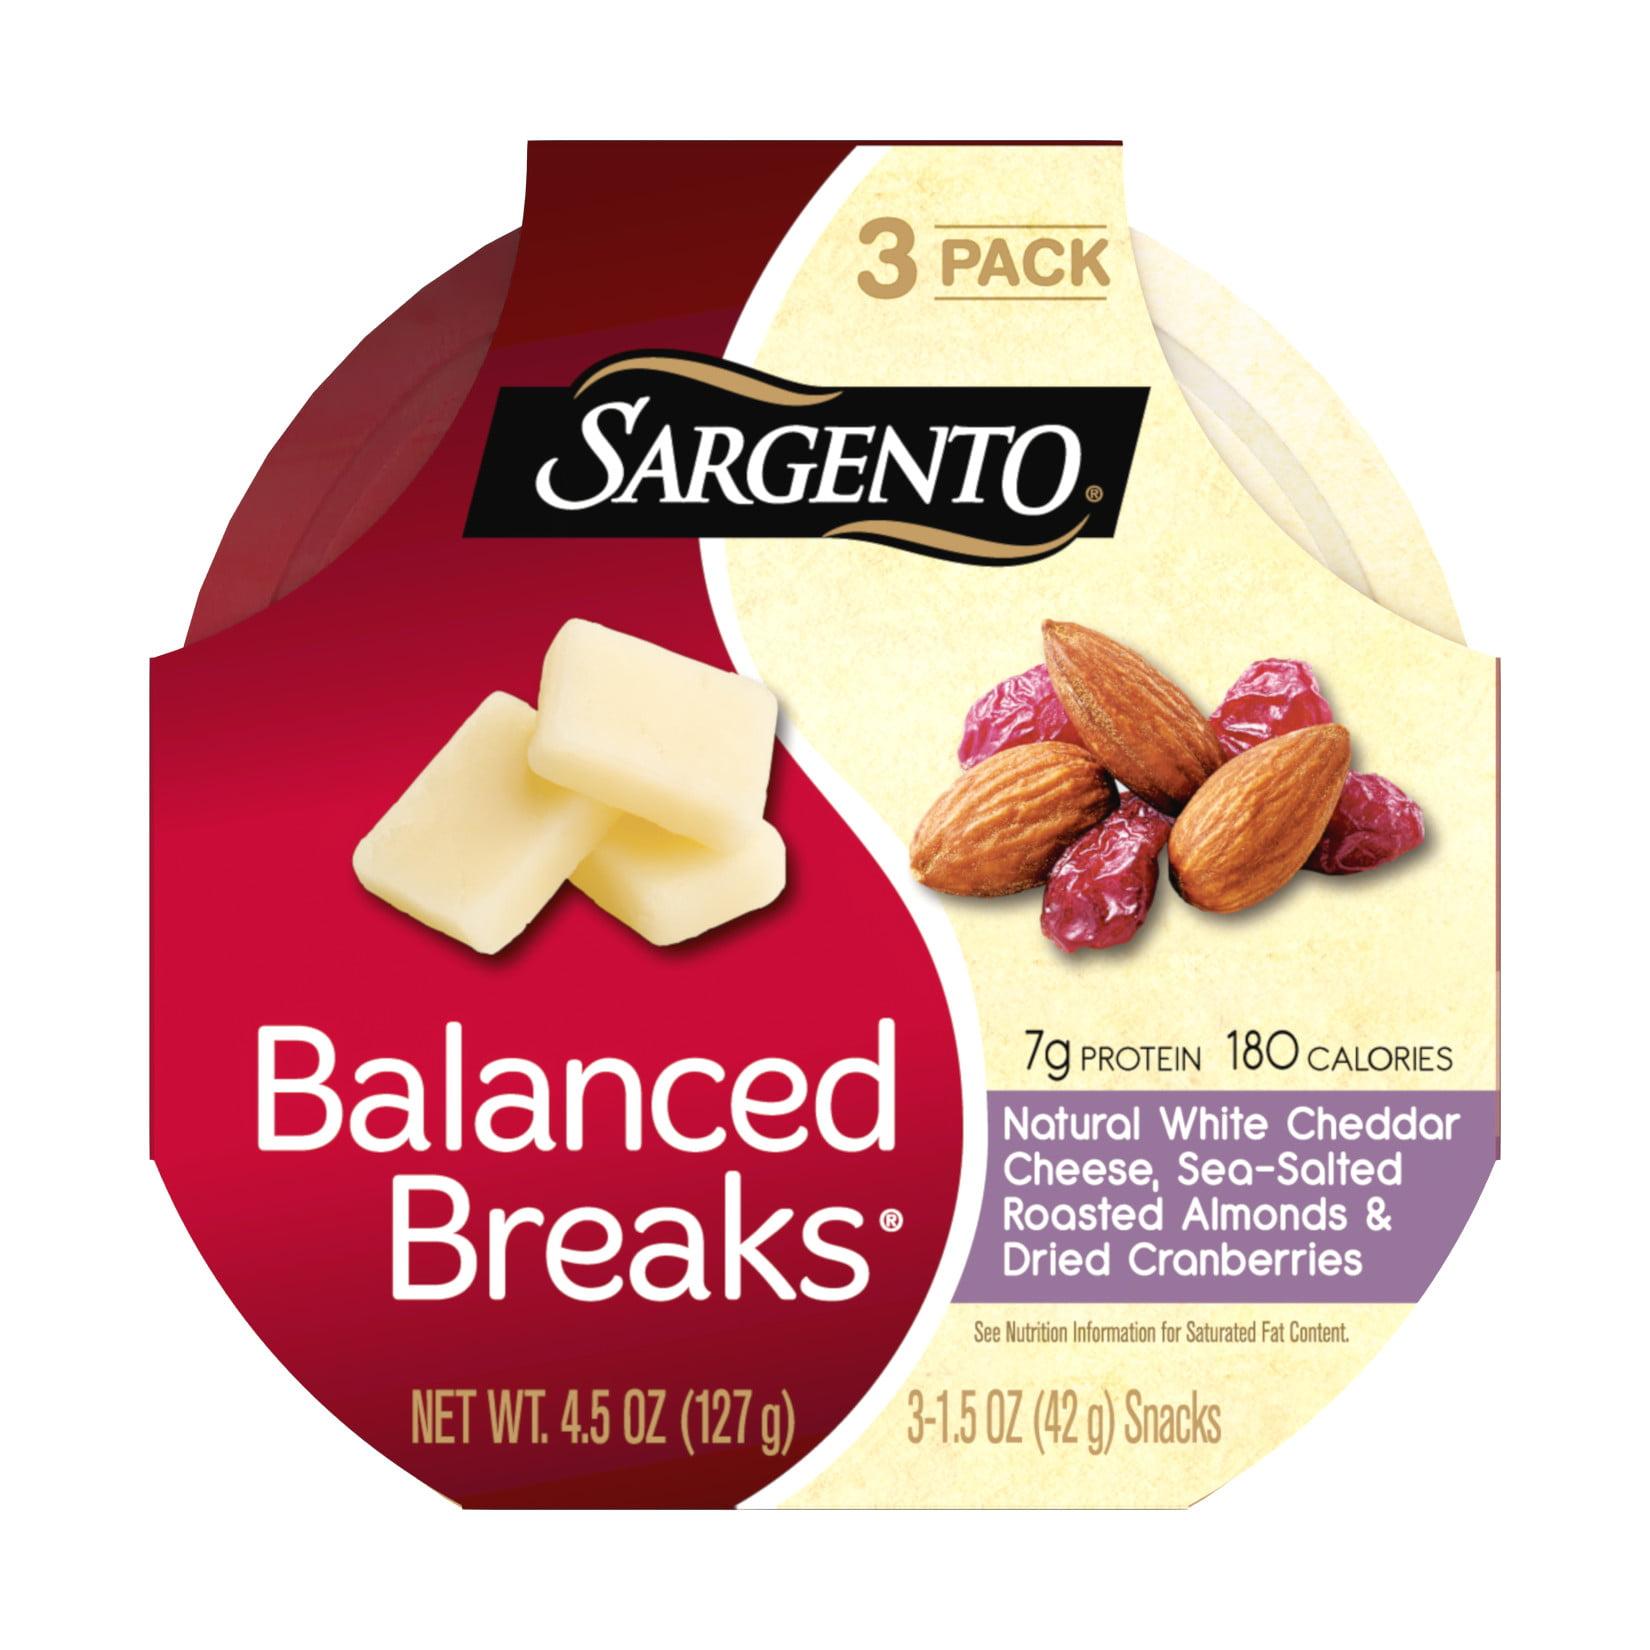 Sargento, Balanced Breaks White Cheddar